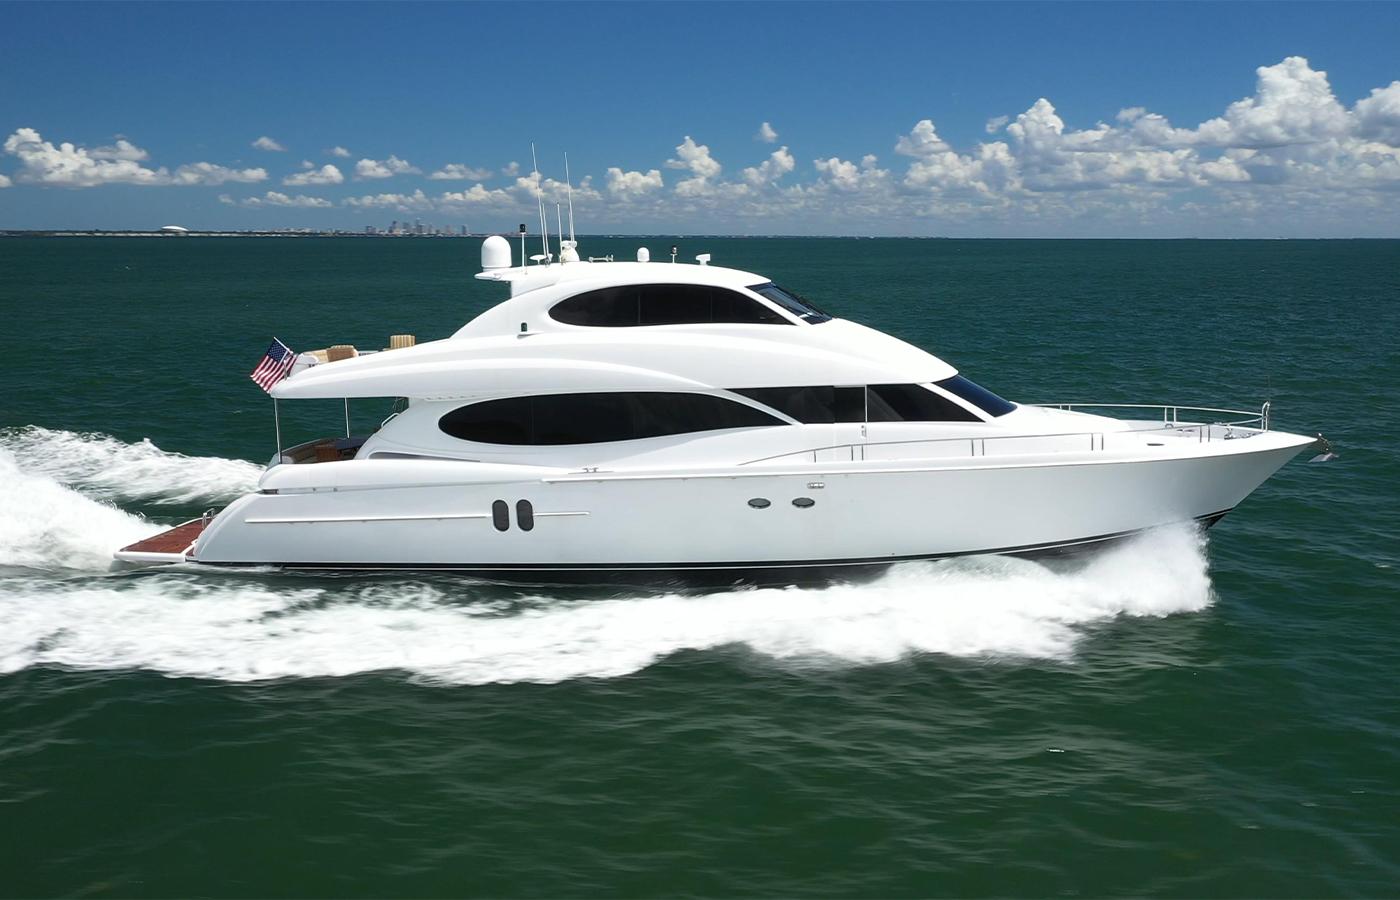 80 Lazzara Yacht Sold By Dean Stuhlmann